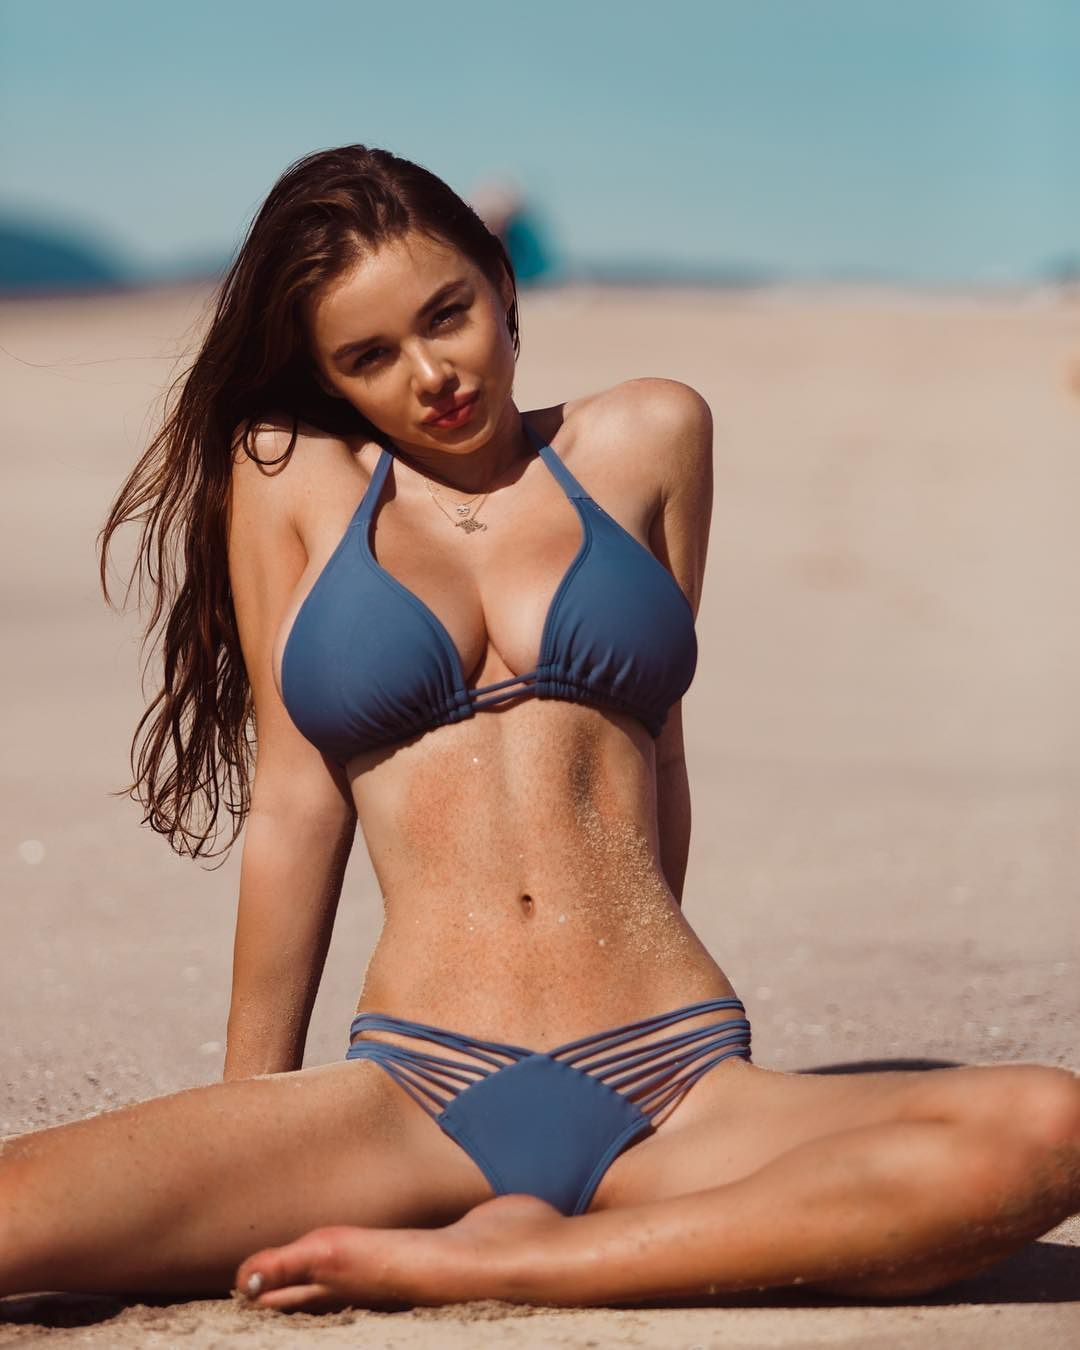 Bikini Sophie Rose